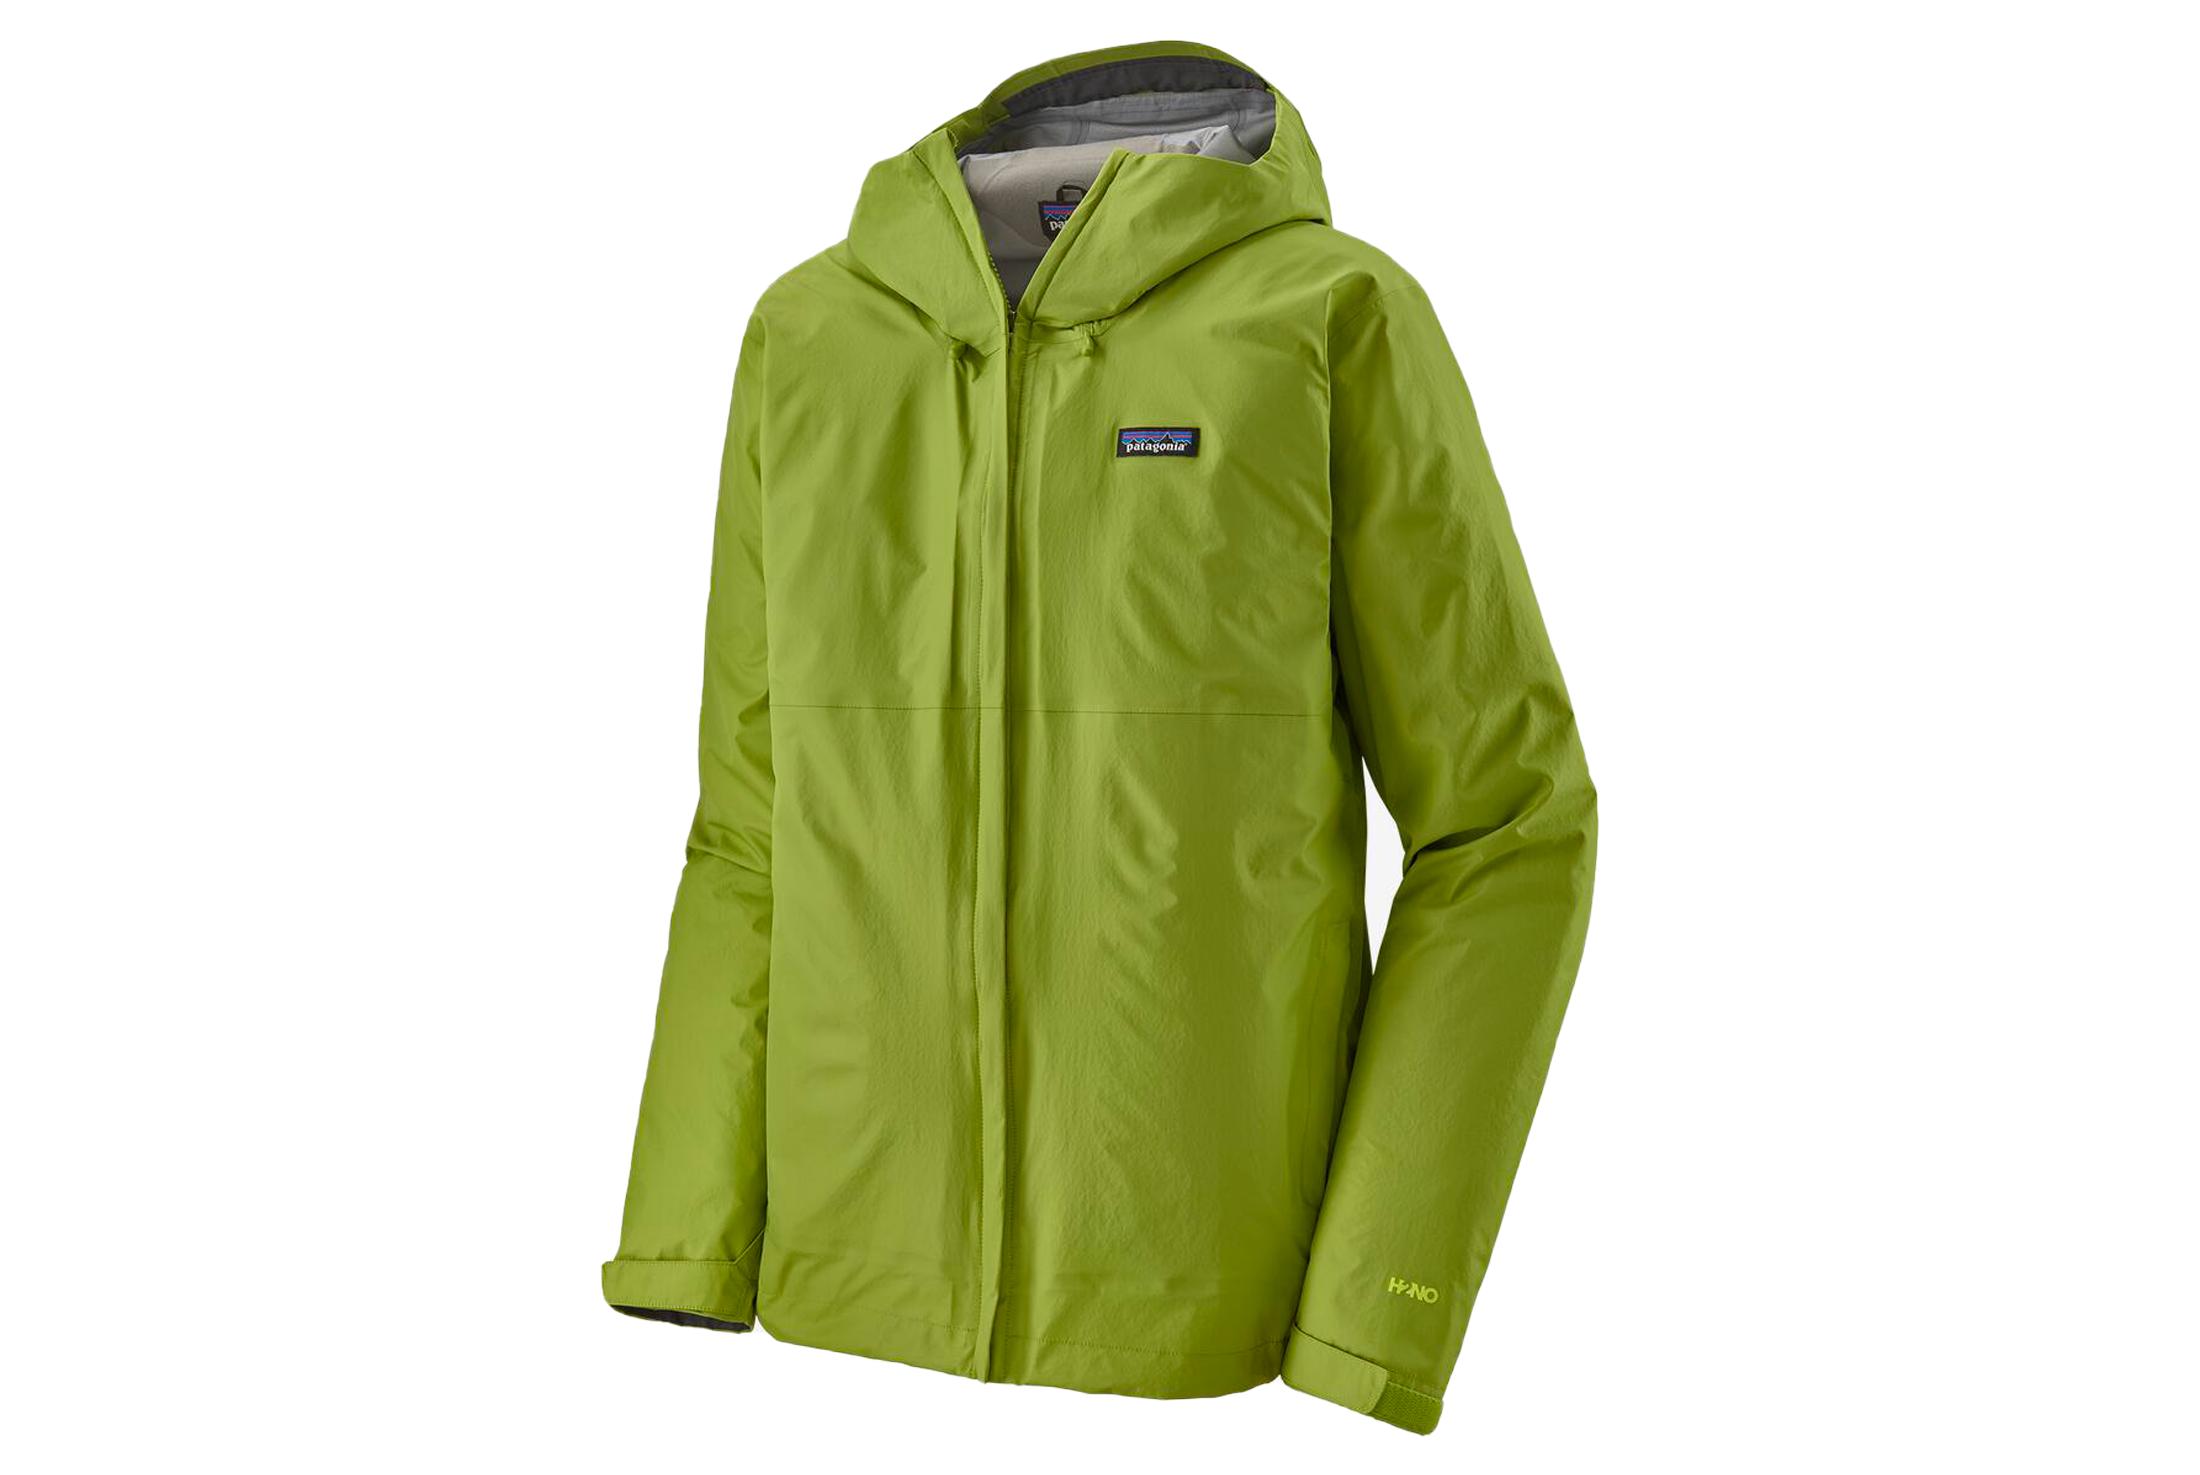 Patagonia Torrentshell 3L Jacket —Men's